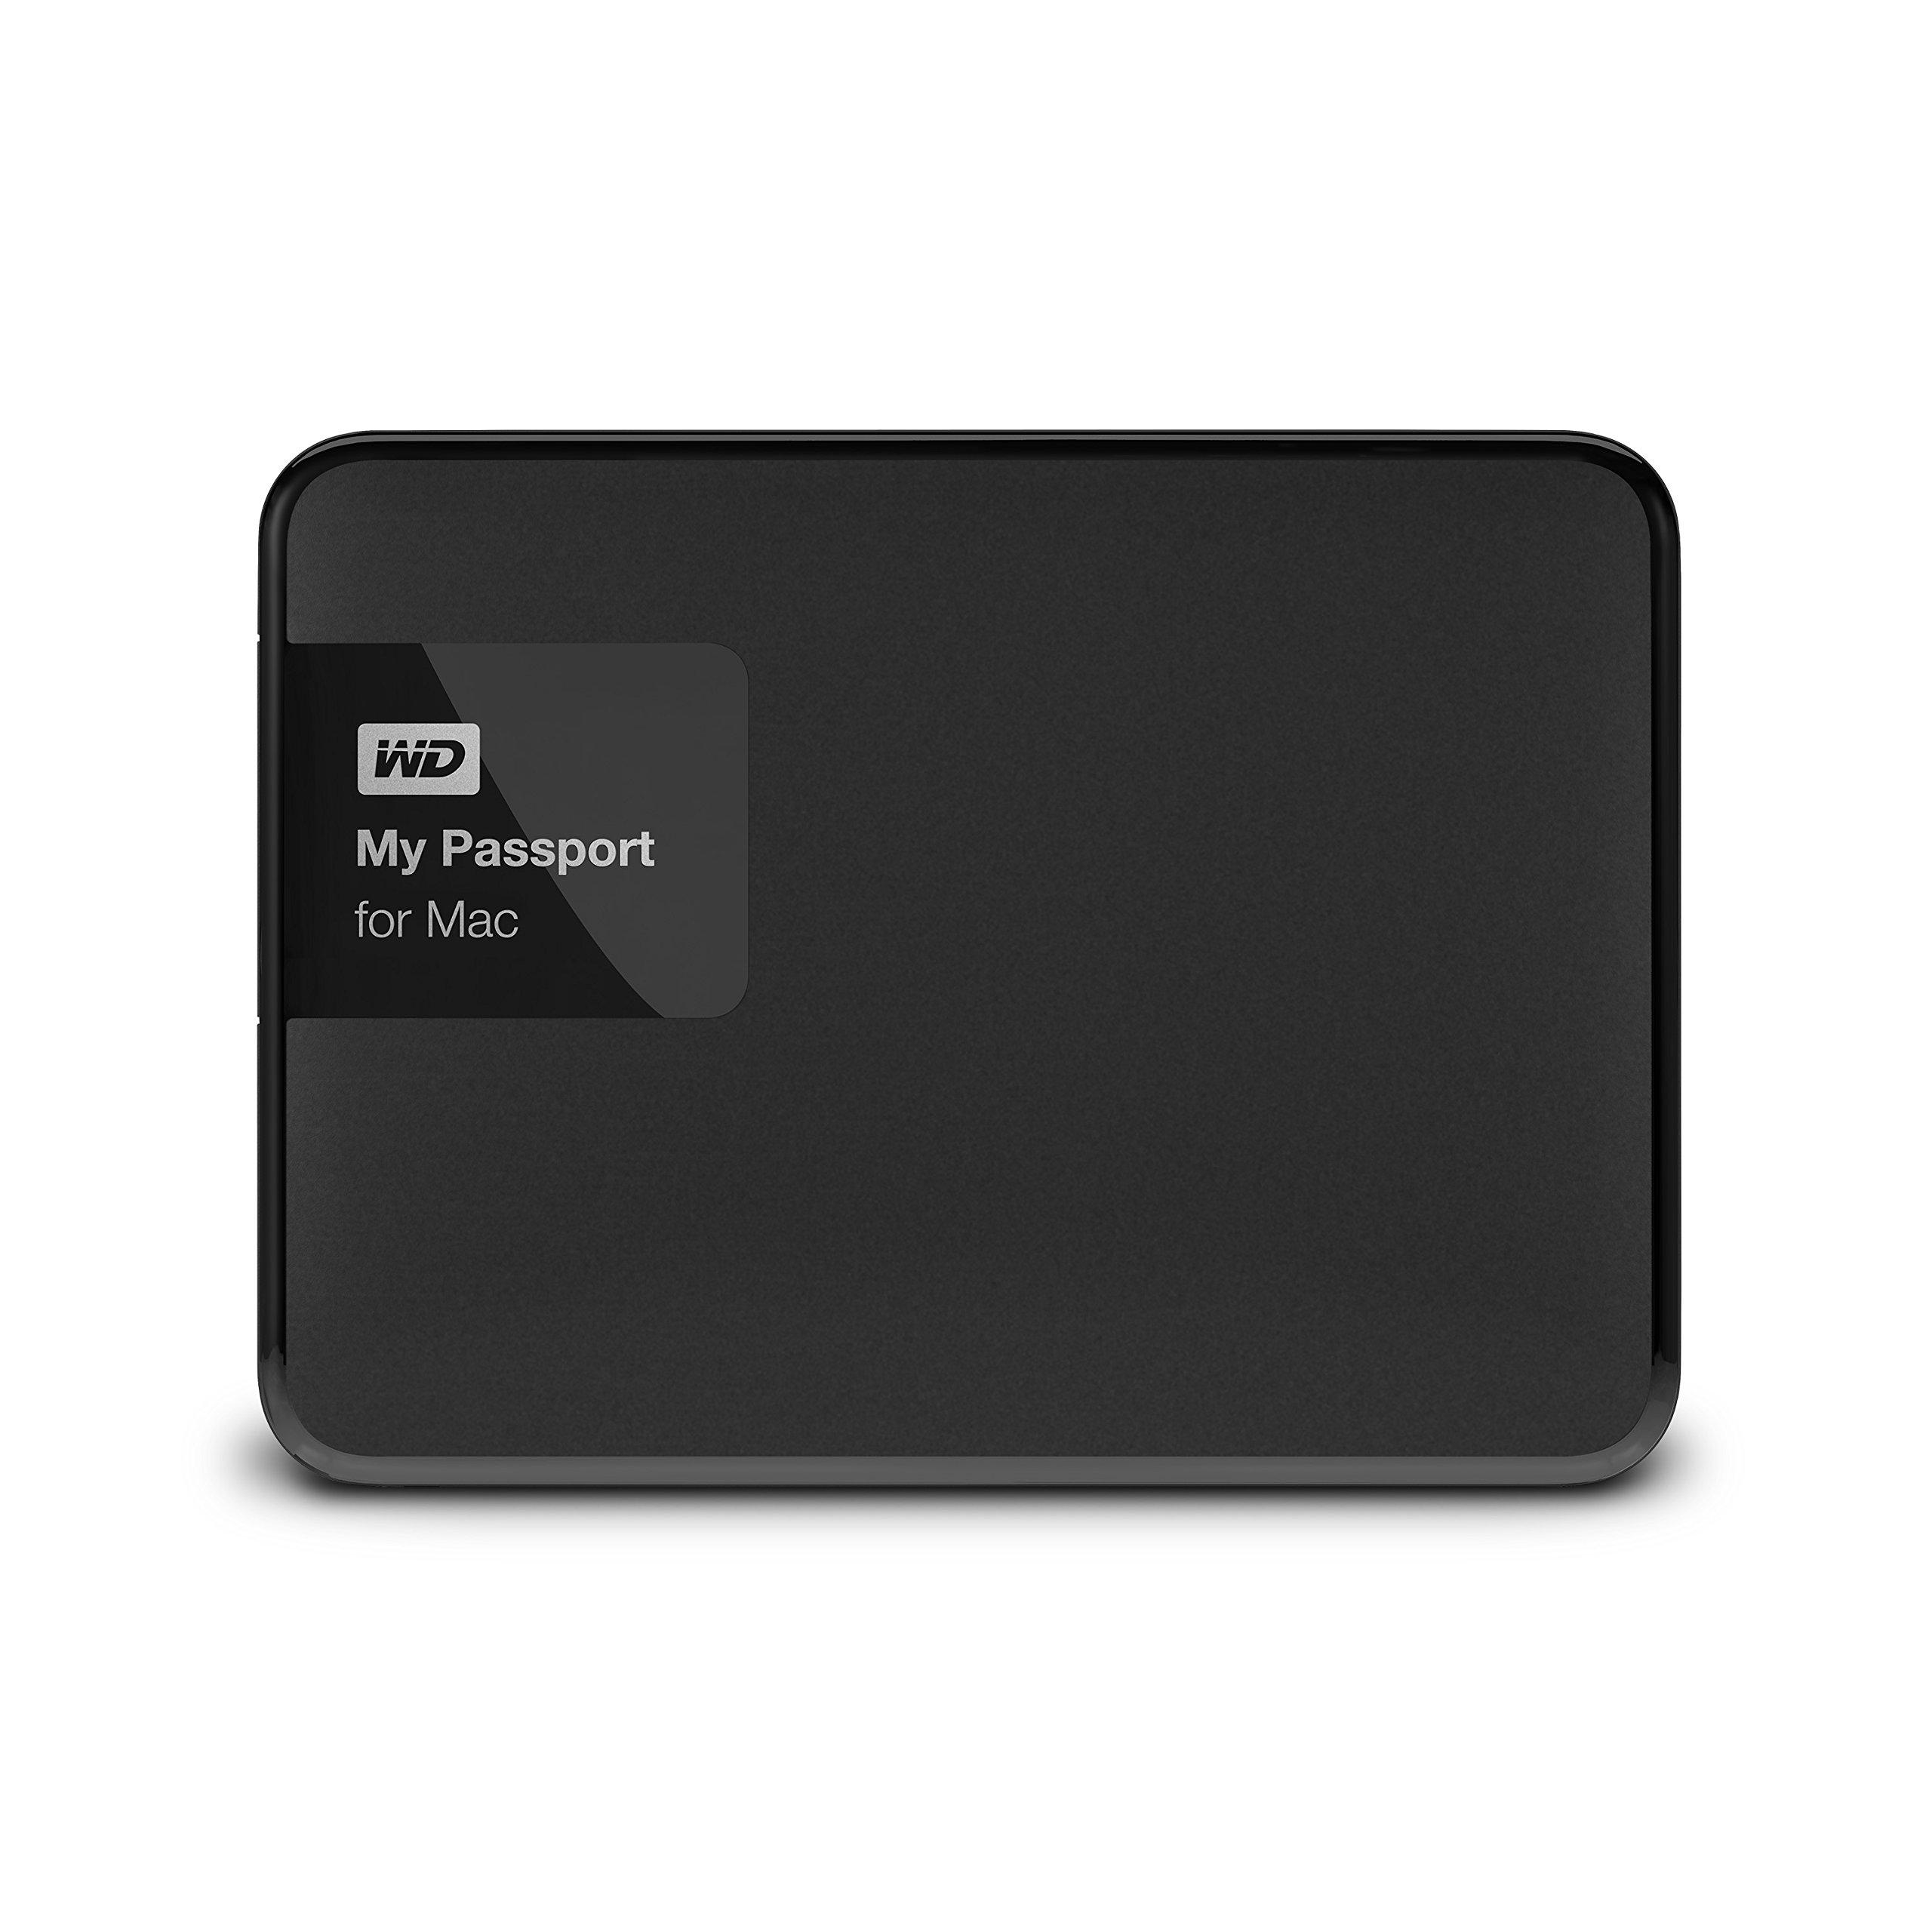 WD 1TB Black My Passport for Mac Portable  External Hard Drive  - USB 3.0  - WDBJBS0010BSL-NESN by Western Digital